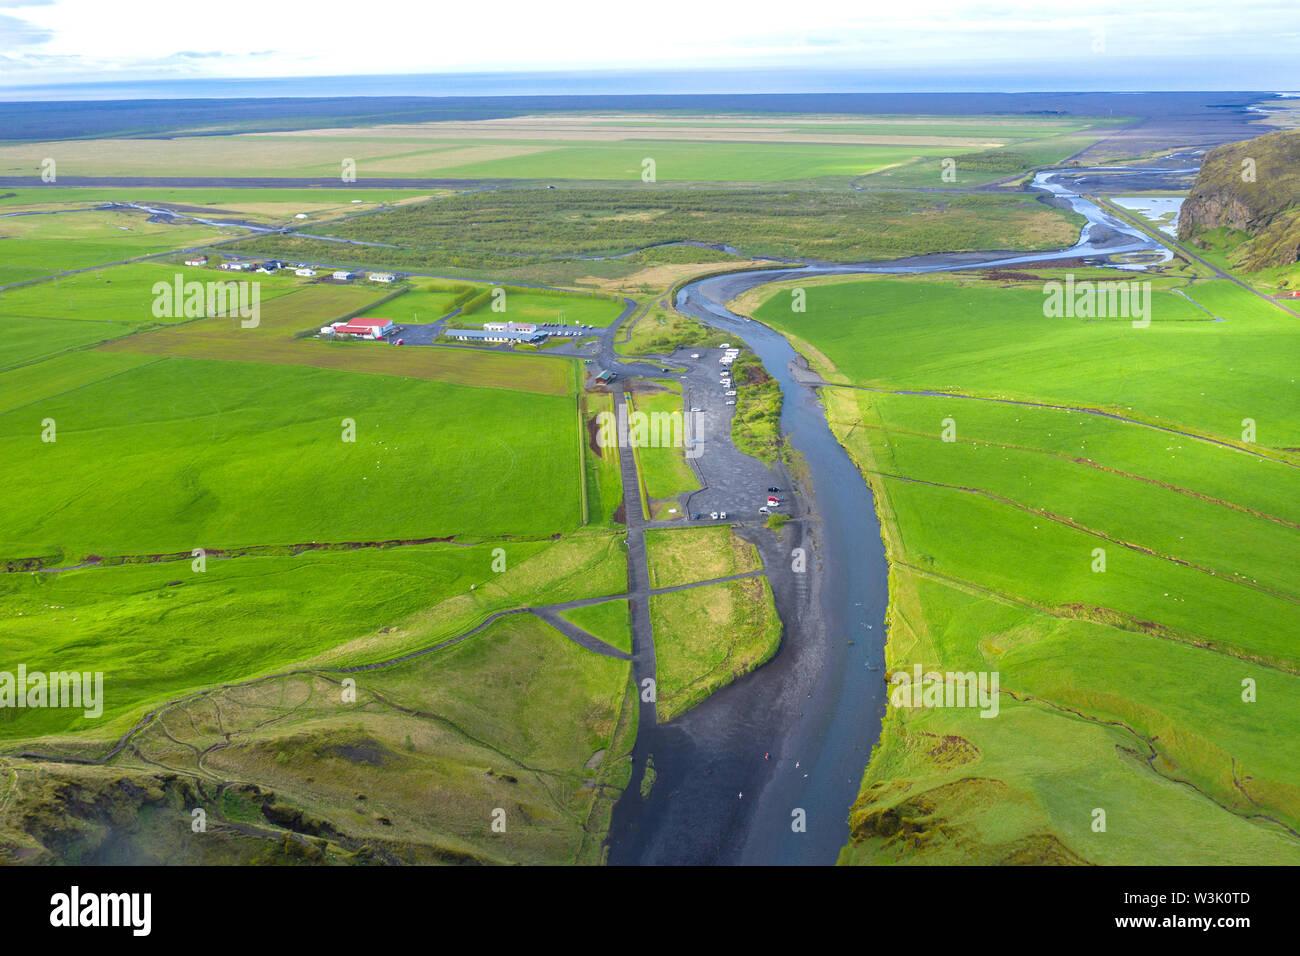 Skogar river, Iceland. Vibrant green Icelandic landscape - Stock Image